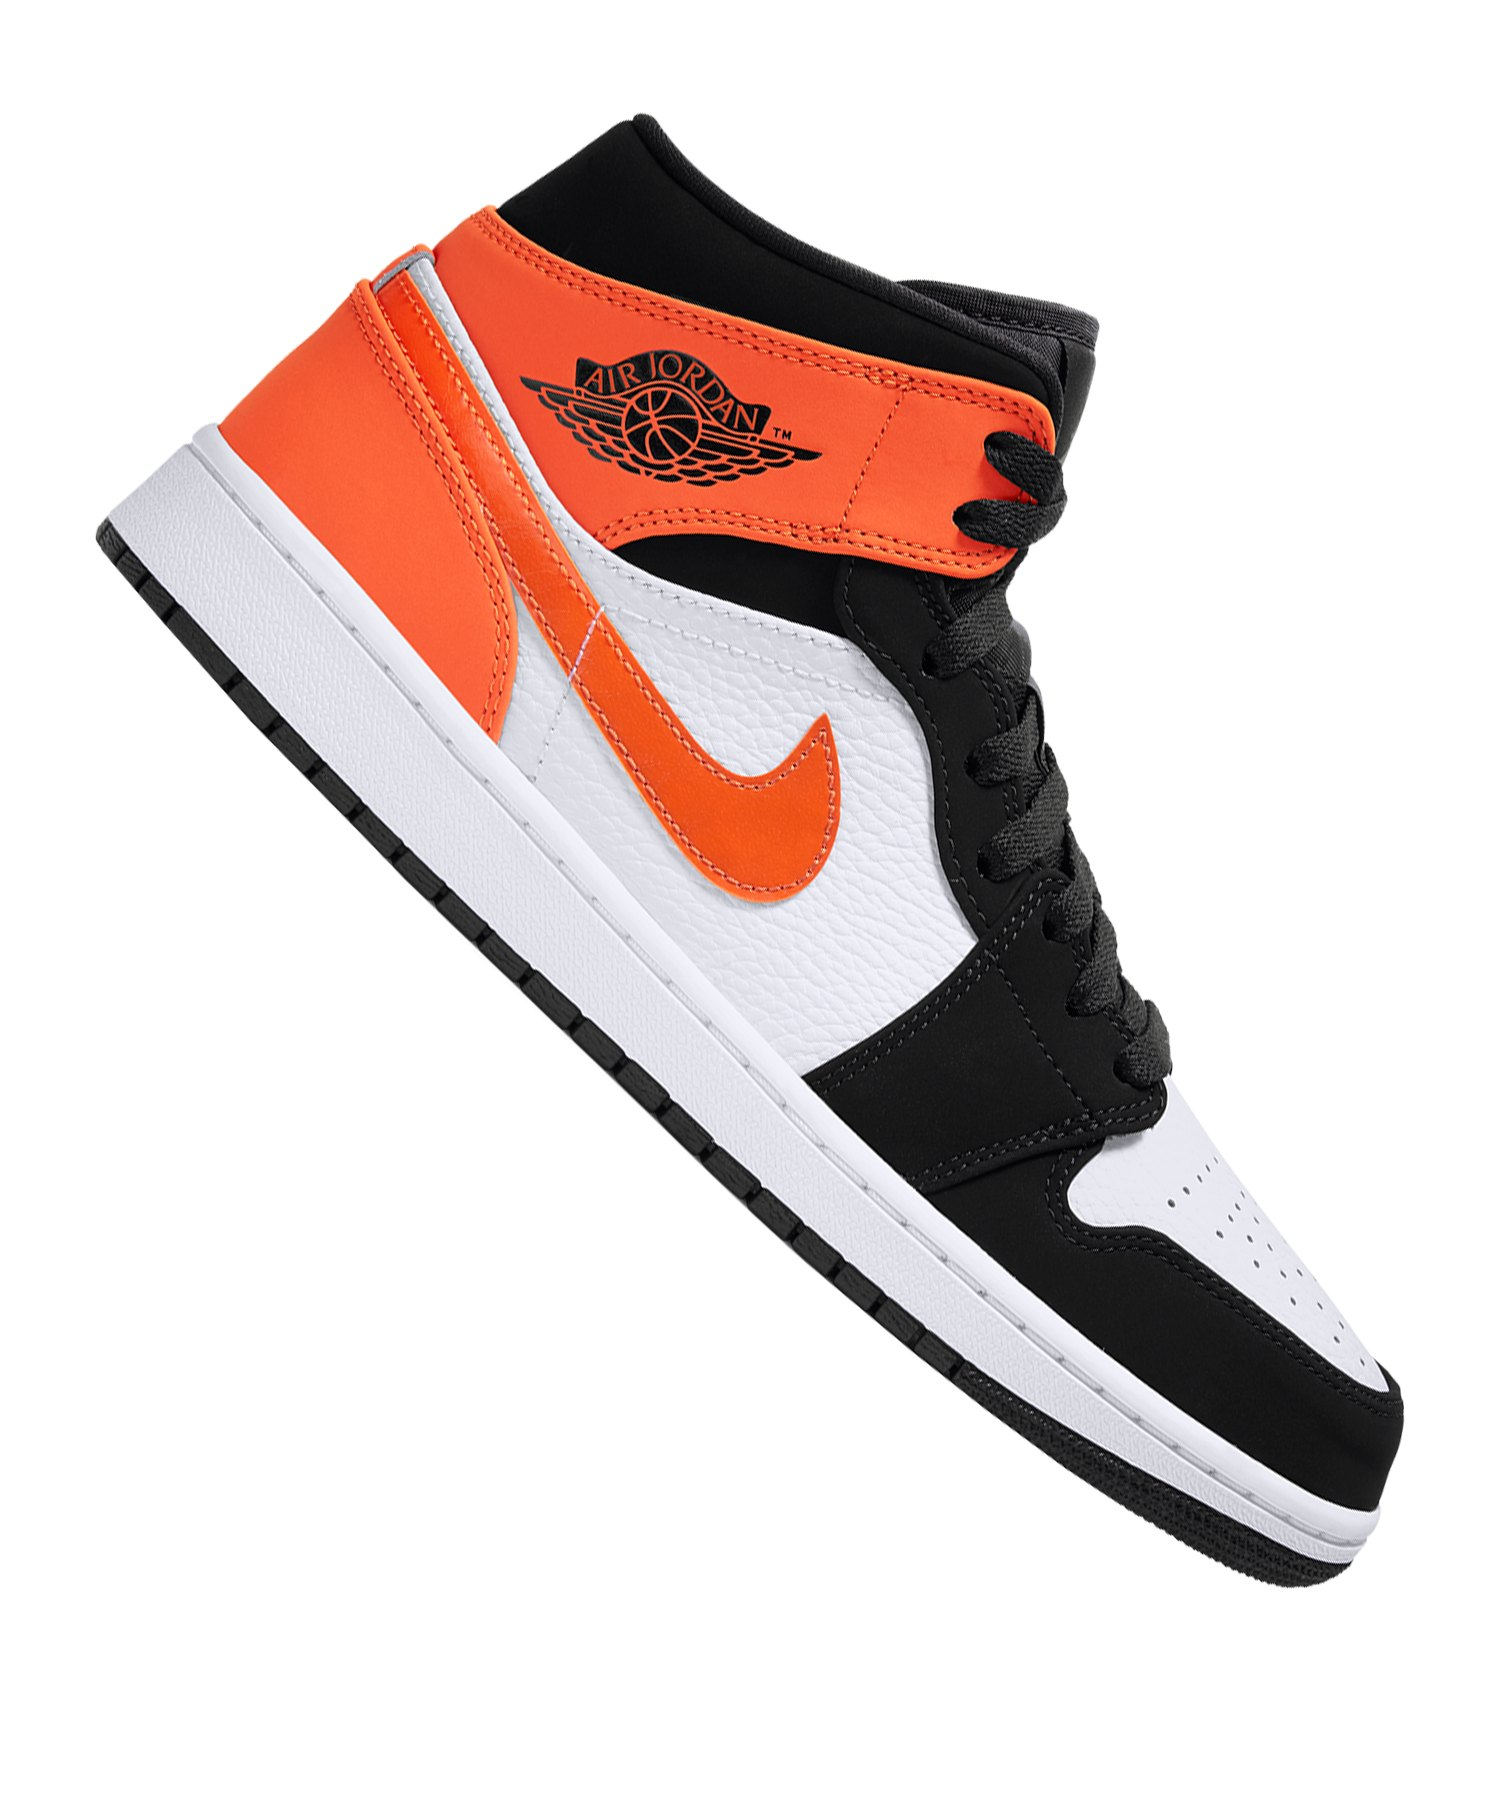 Jordan Herren Air 1 Mid 554724 050 Hohe Sneaker